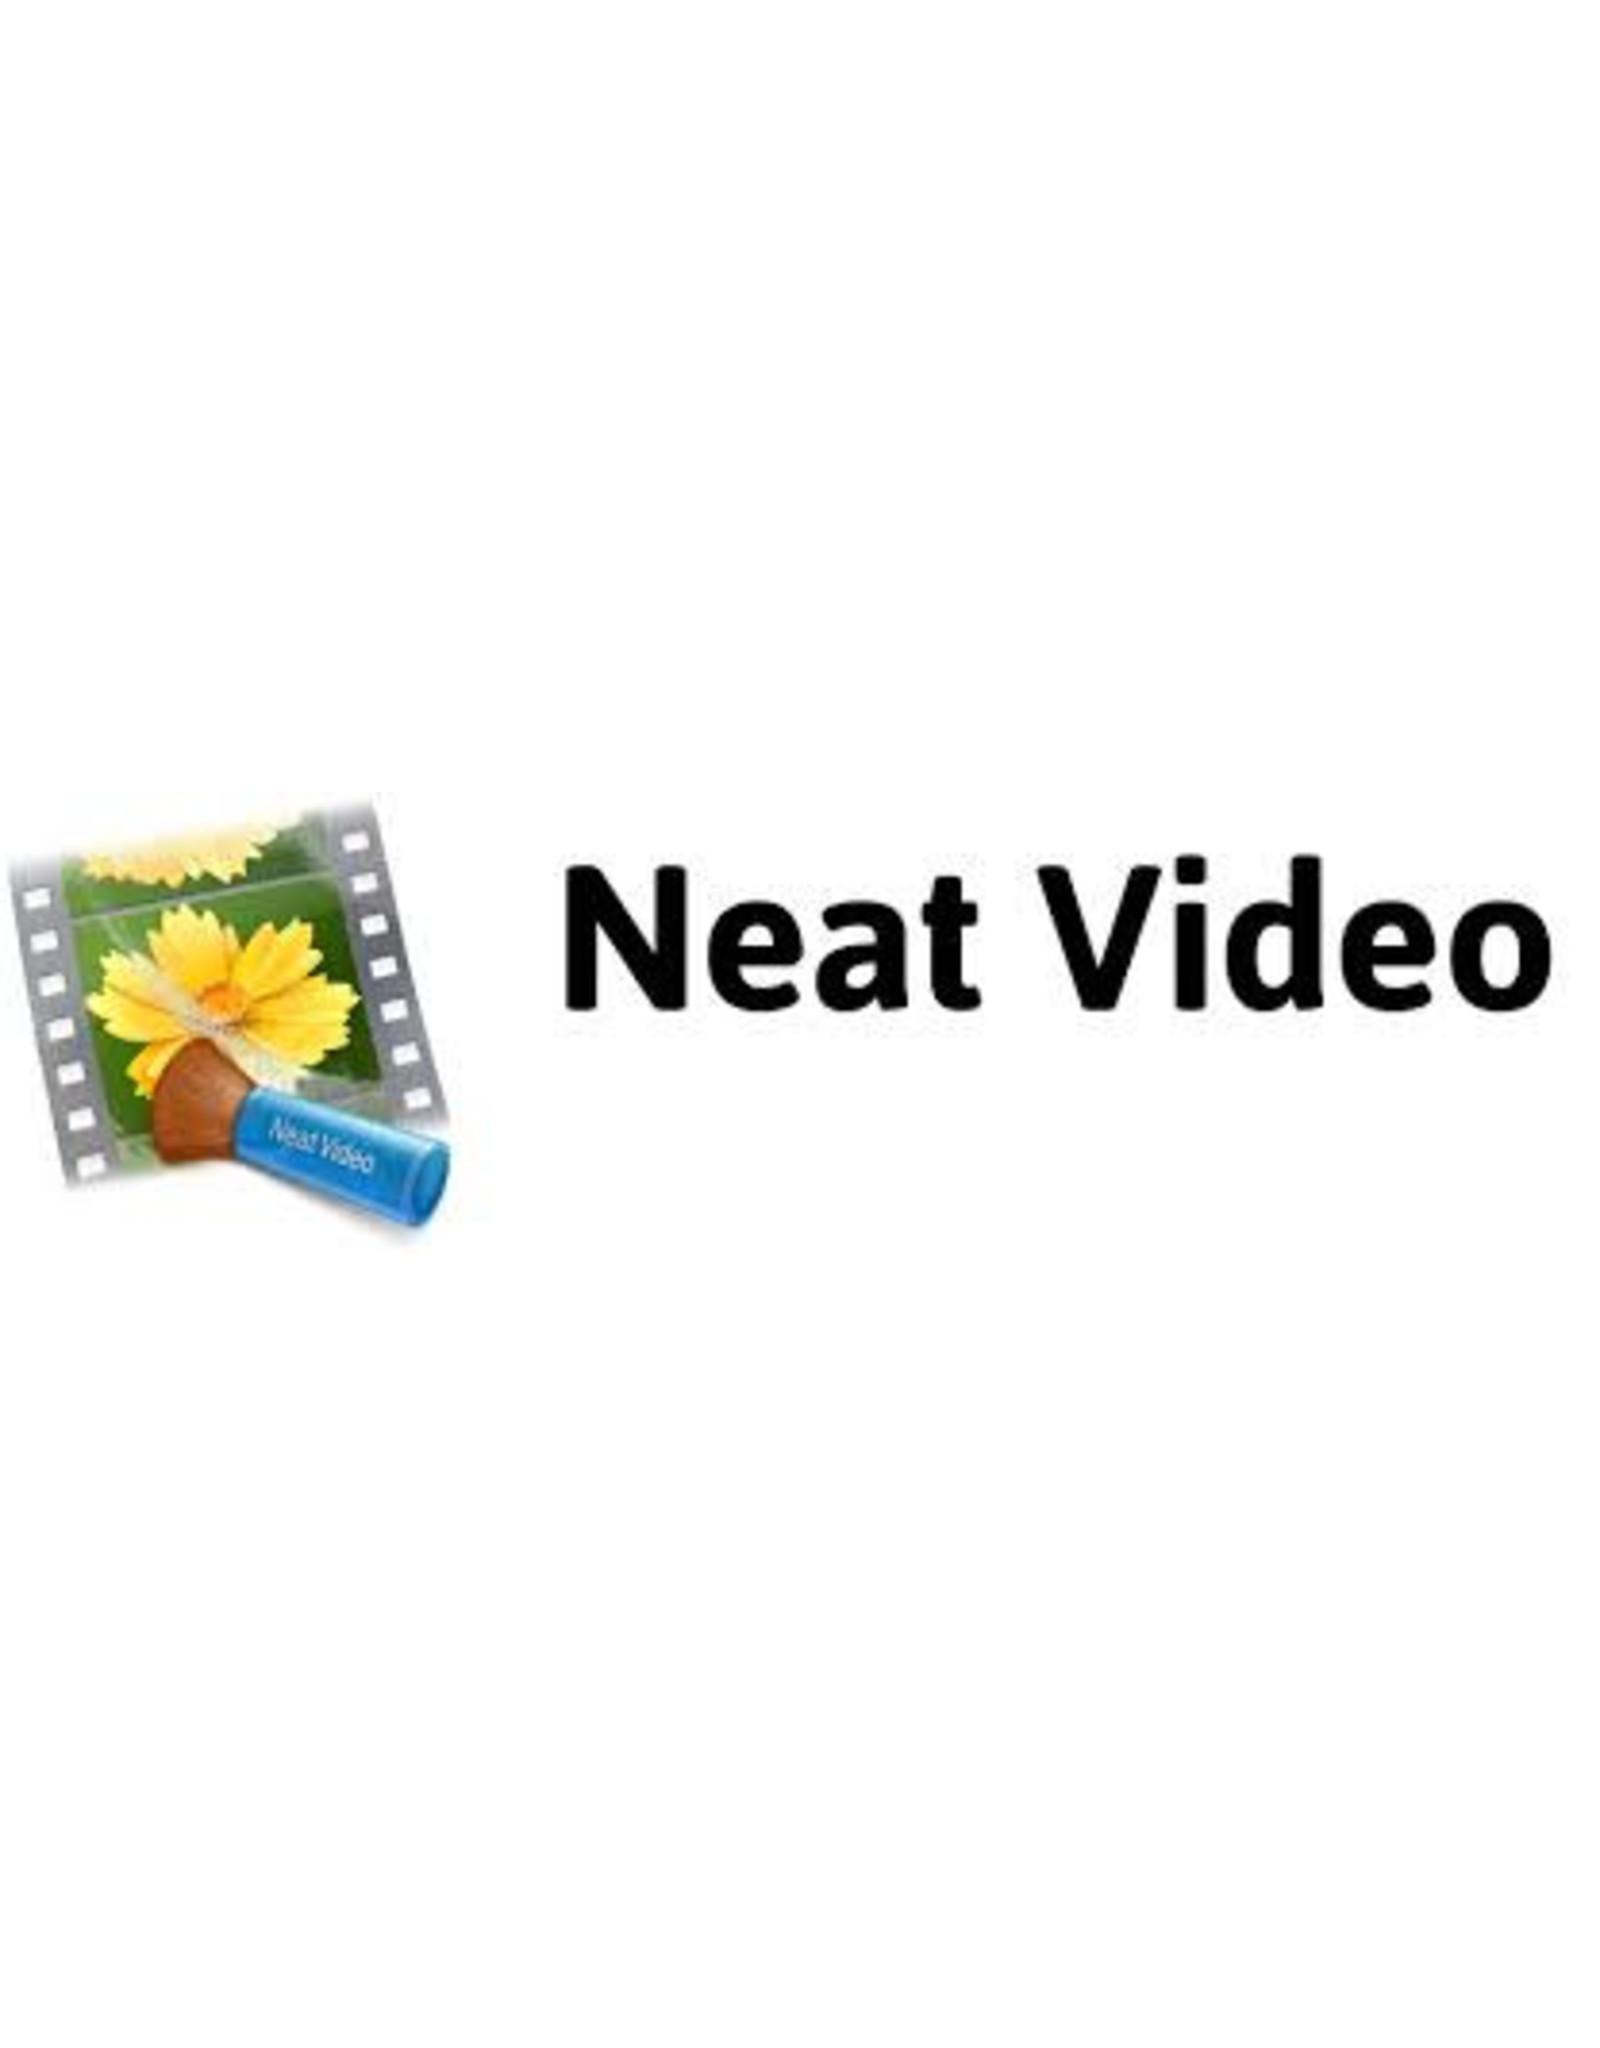 NeatVideo 4.8 Pro for EDIUS 9